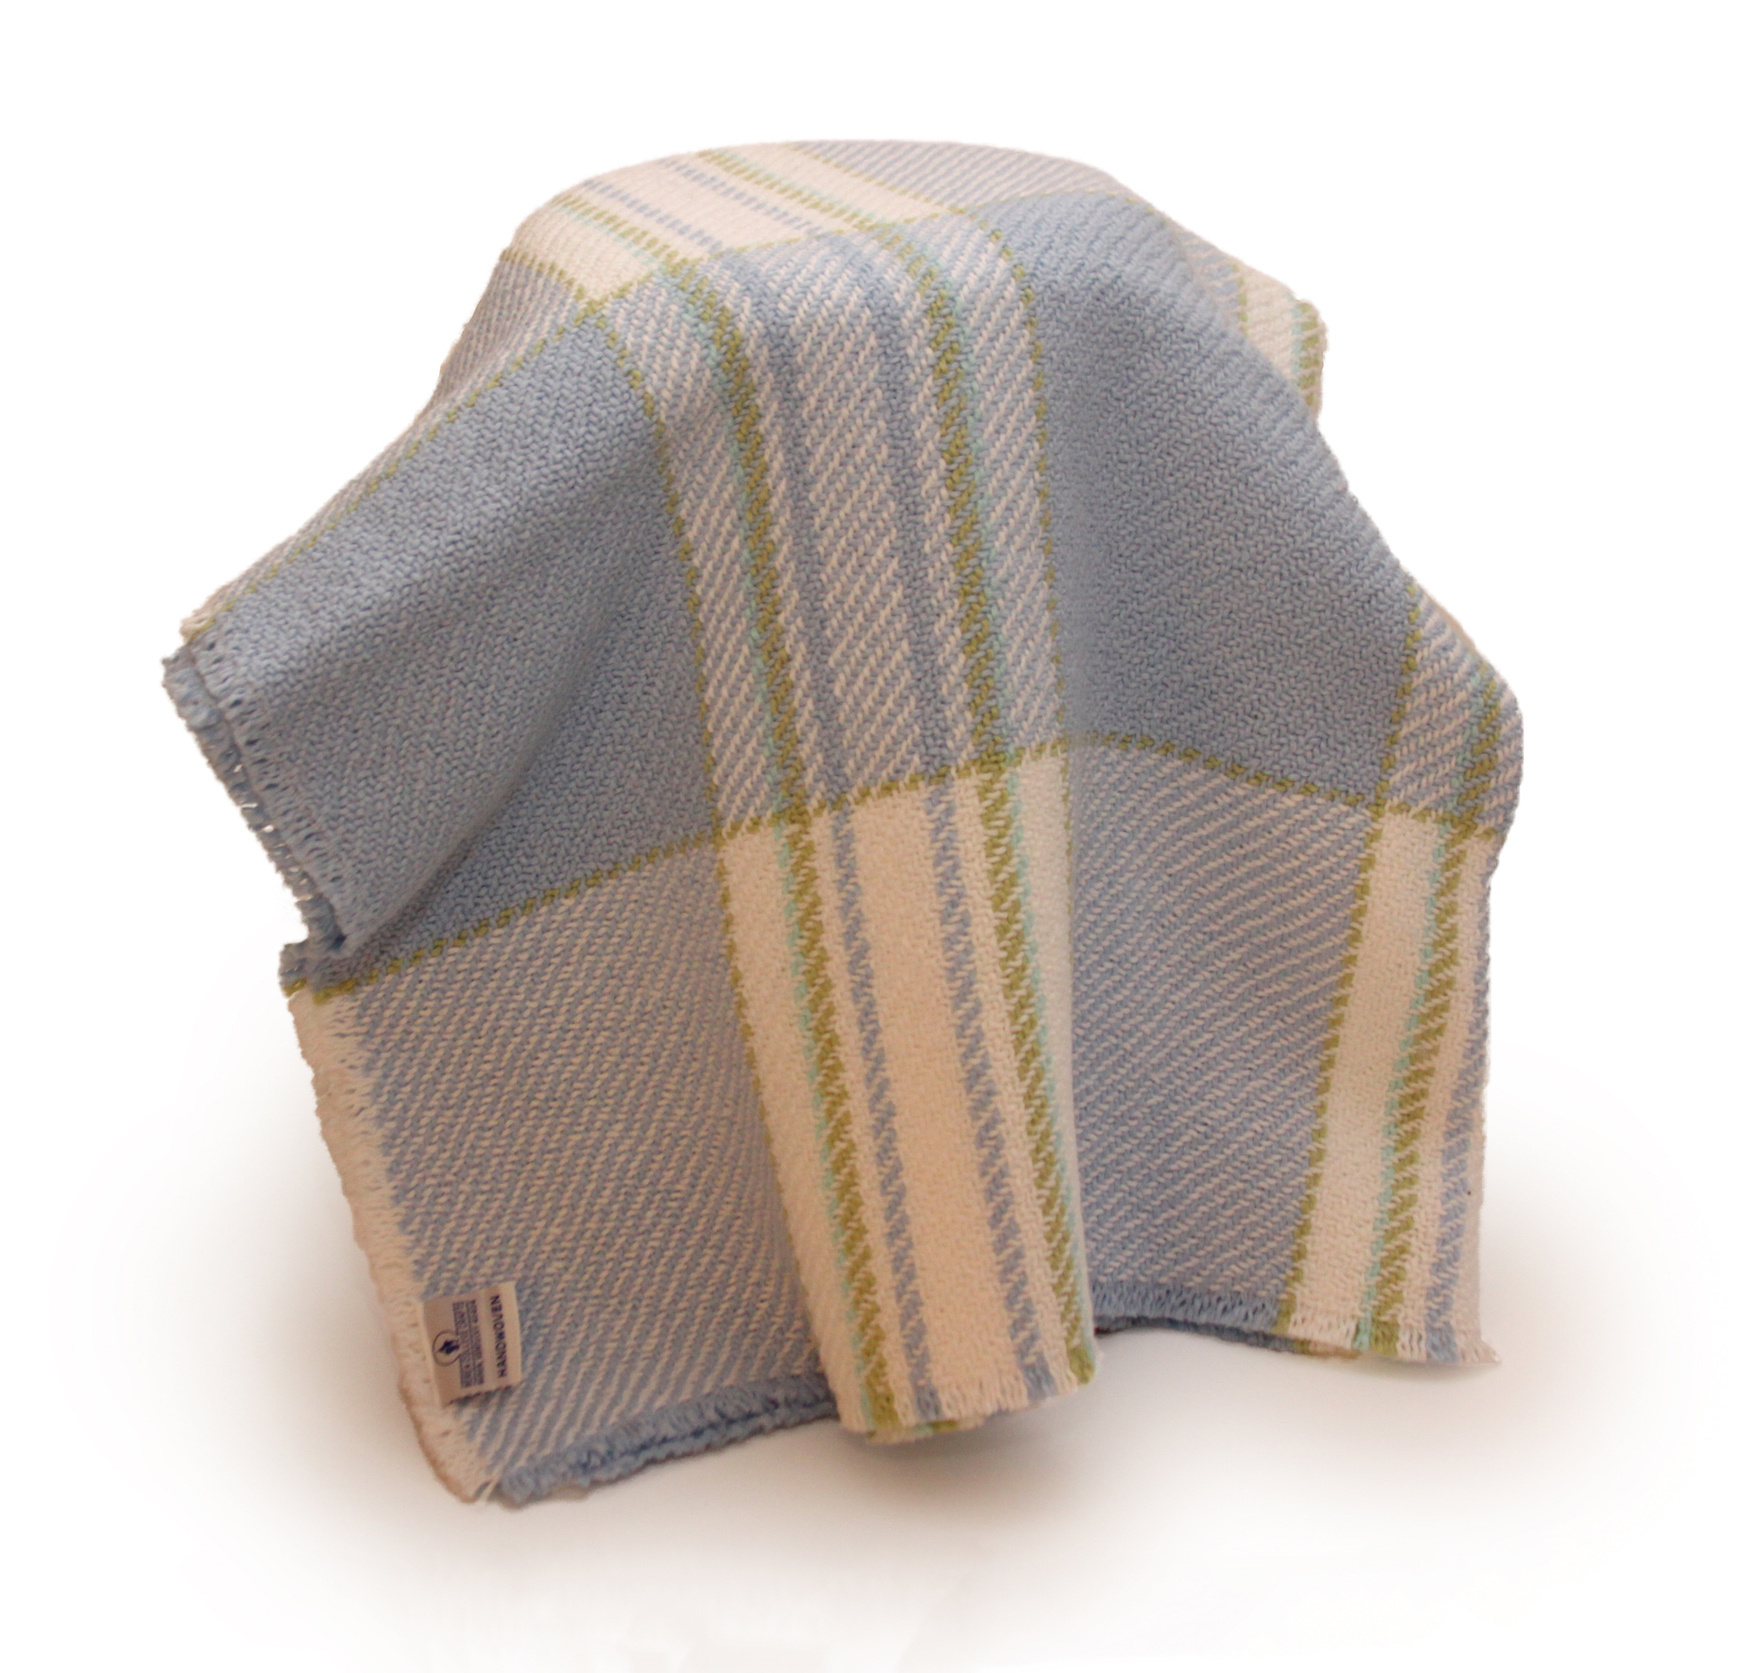 Plaid Baby Blankets-1